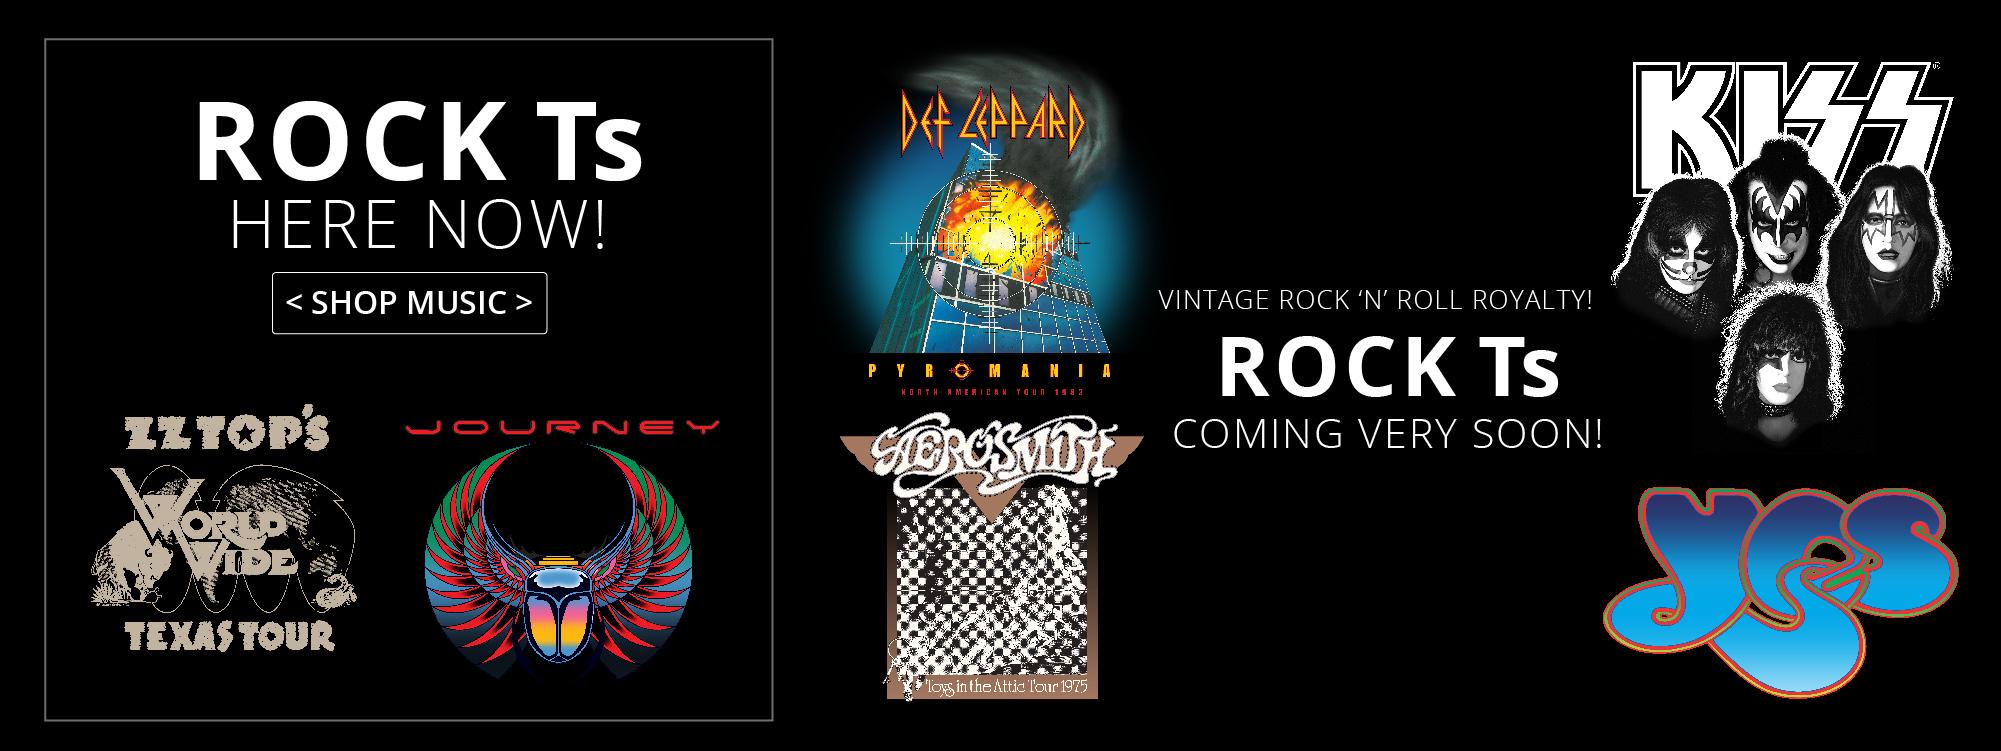 vintage rock t-shirts, Kiss t-shirts, journey t-shirts, yes t-shirts, rock tour t-shirts, Def leppard, zz top, aerosmith